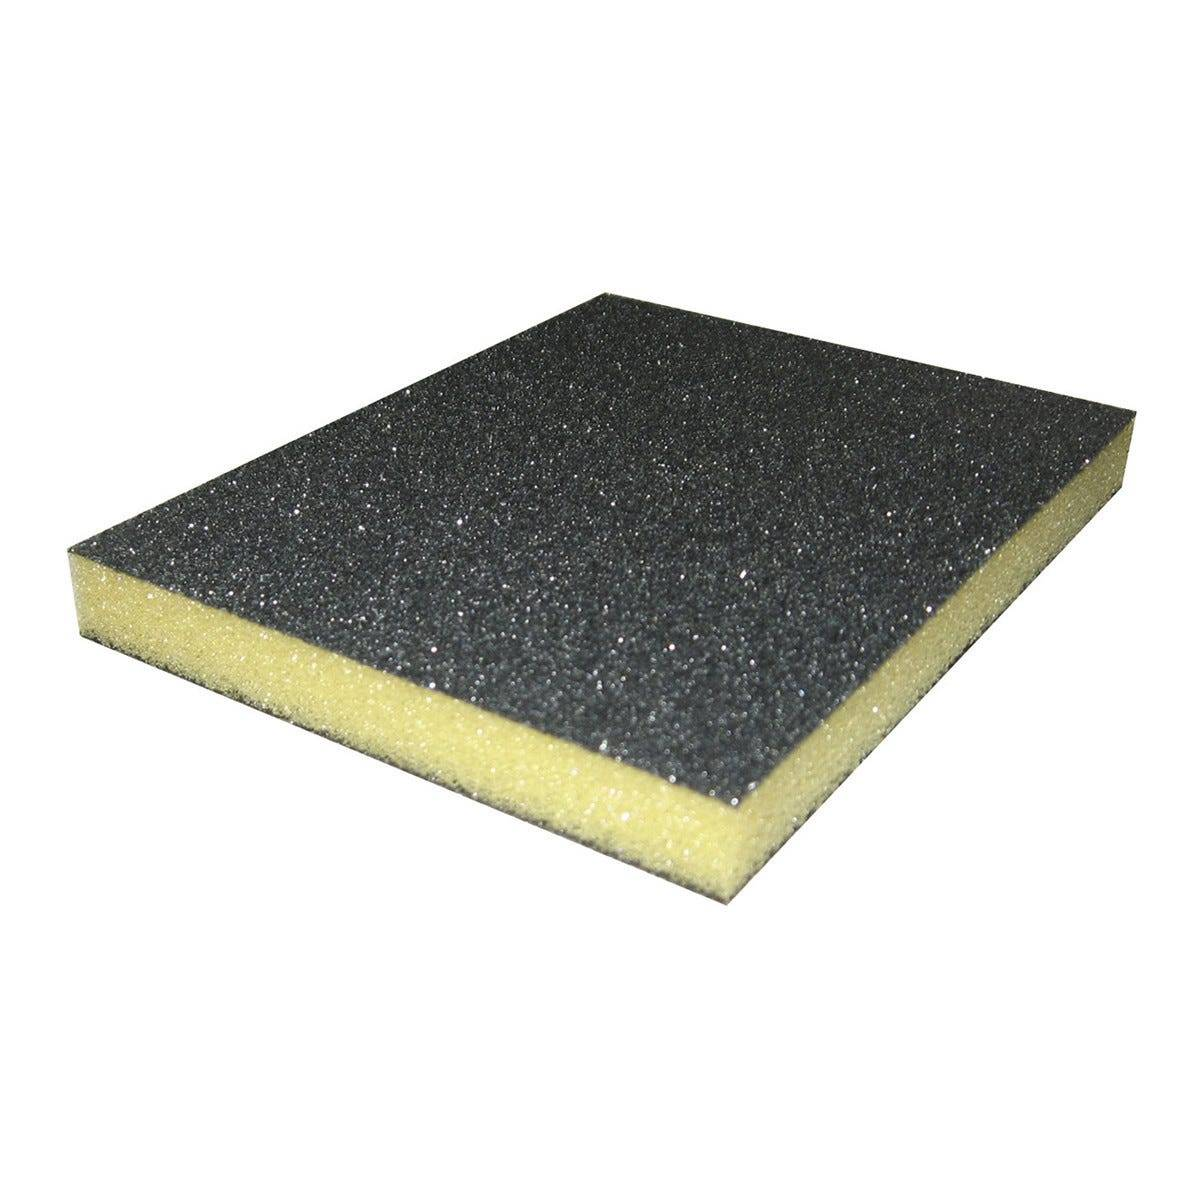 2 Spugne Abrasive 123x98x12 Grana 100